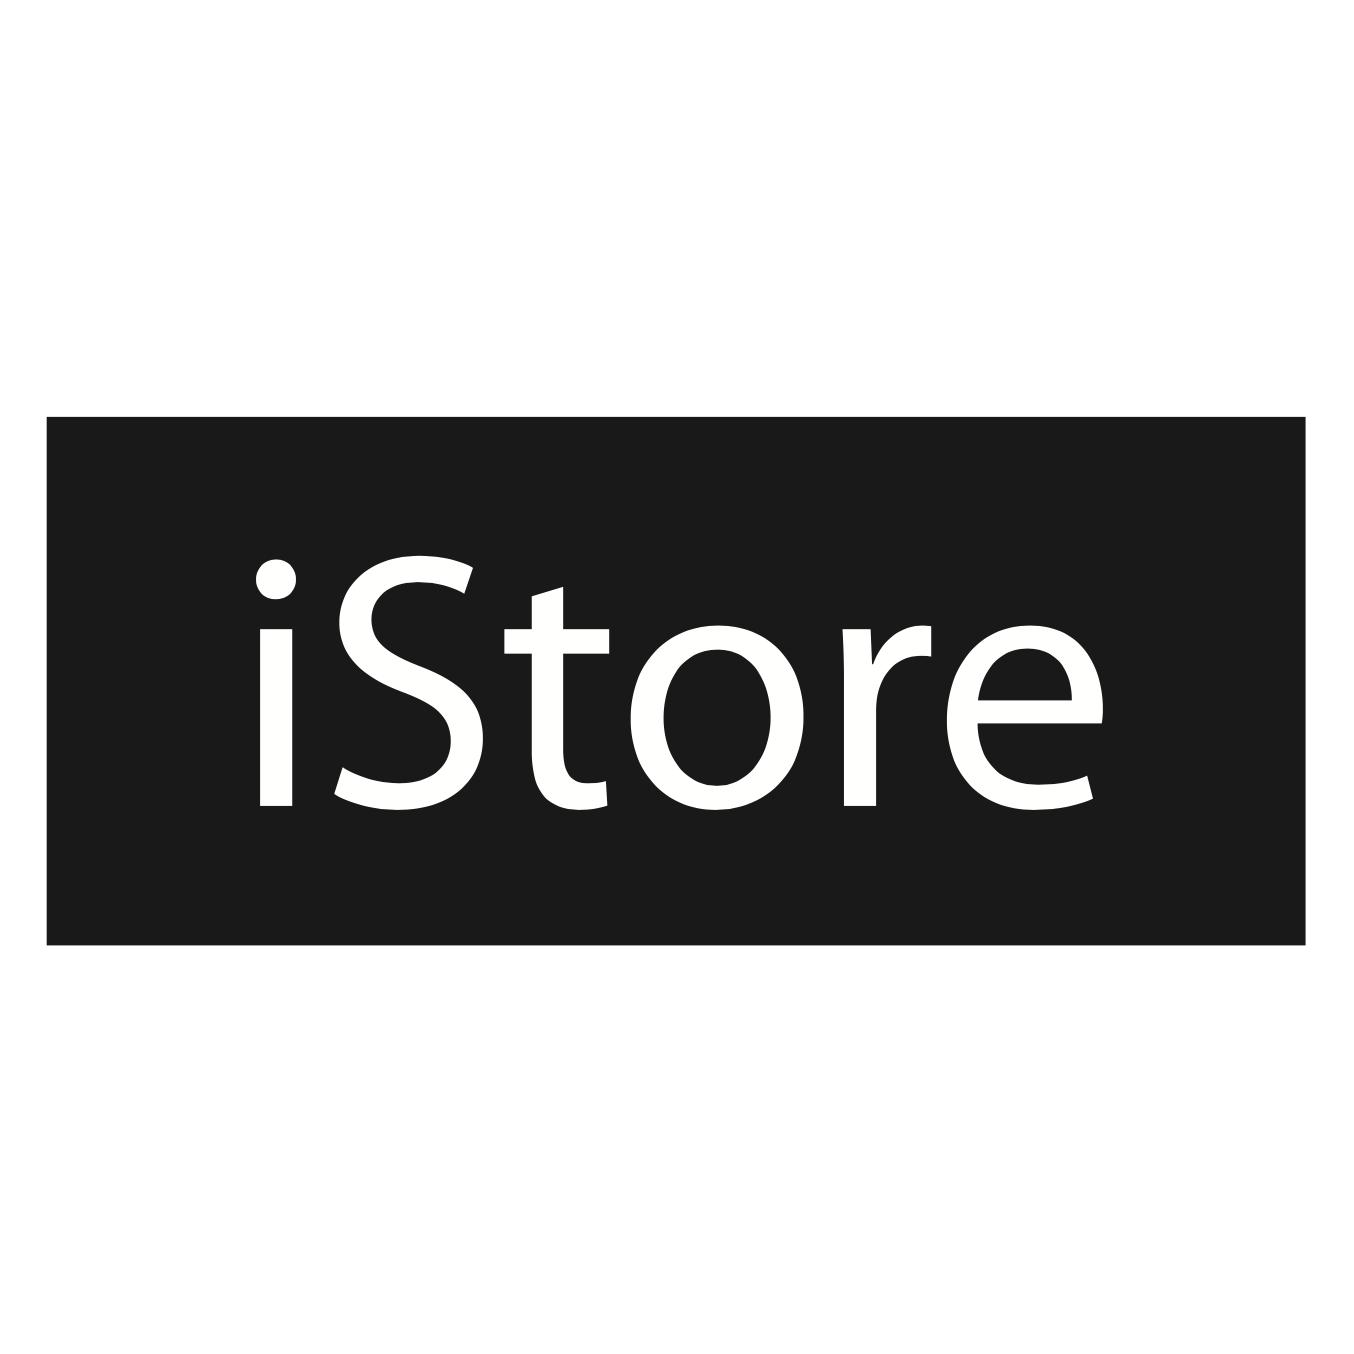 iPhone 5/5s Crystal Slider - Black